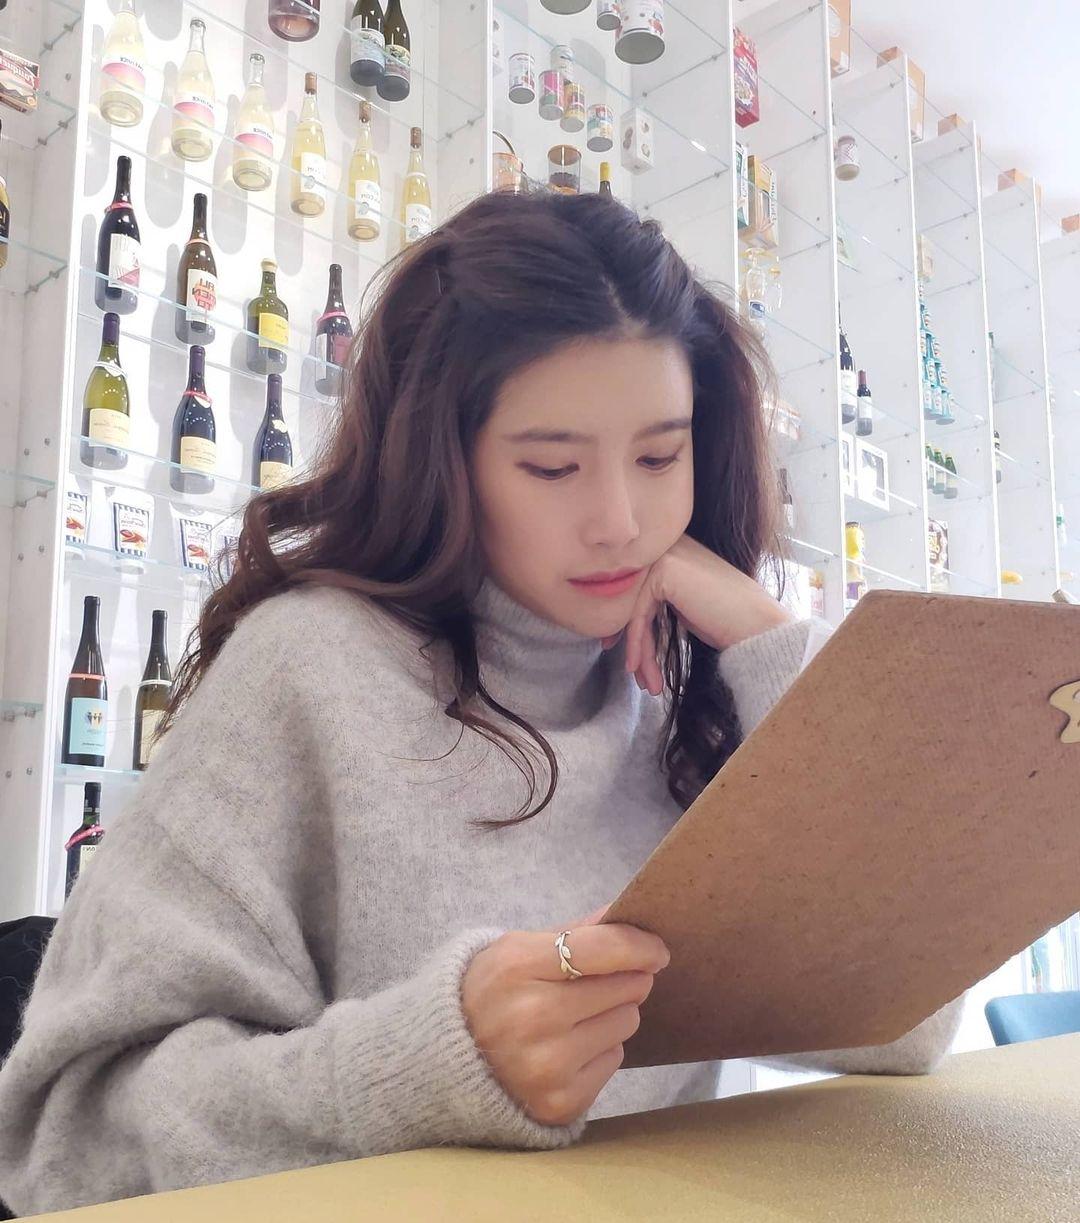 gina maeng thesummergirl_10